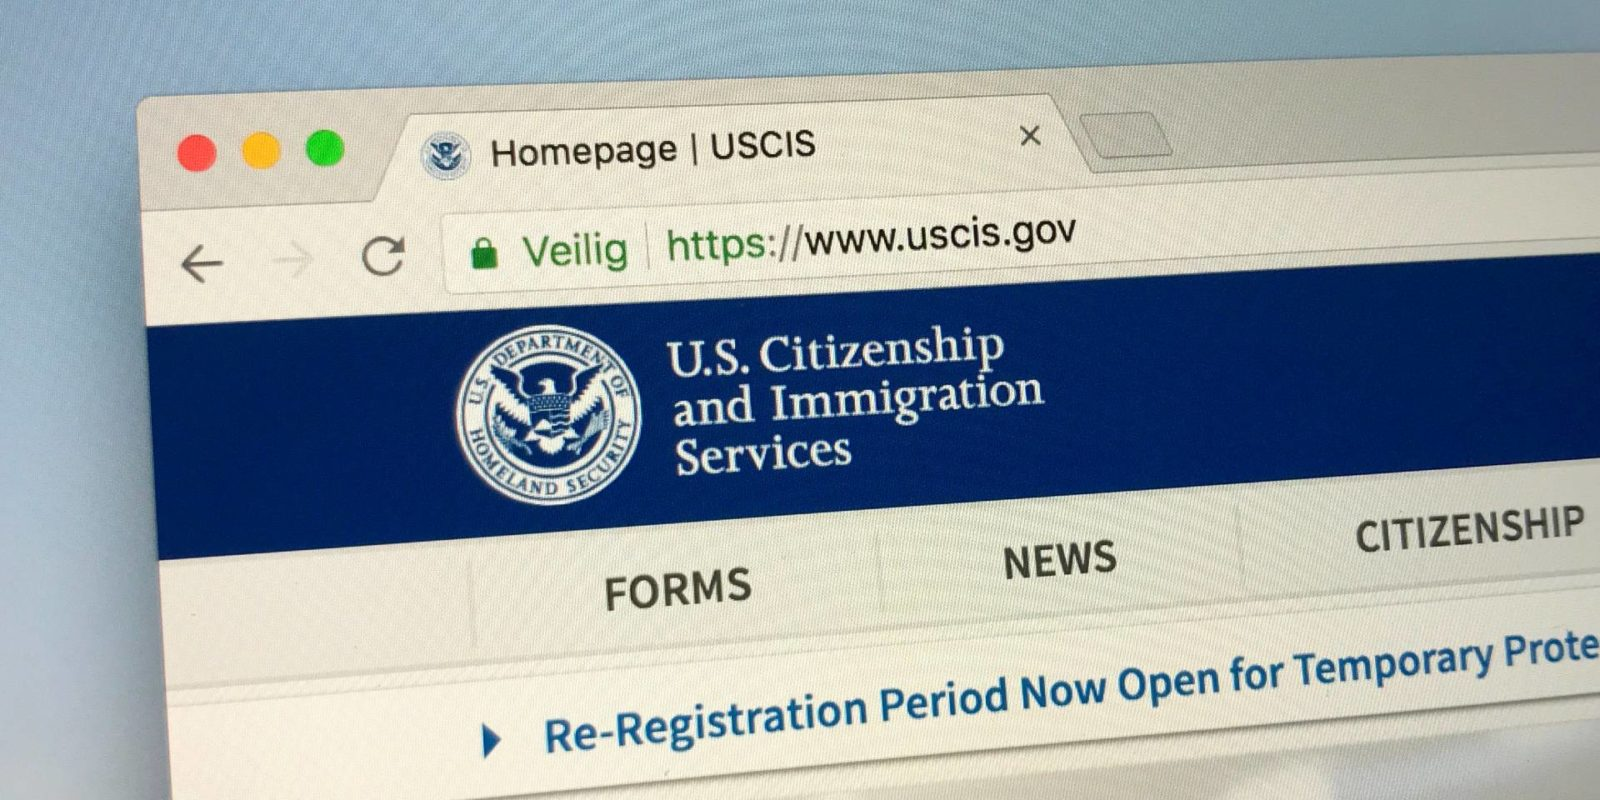 uscis website has information on the q visa